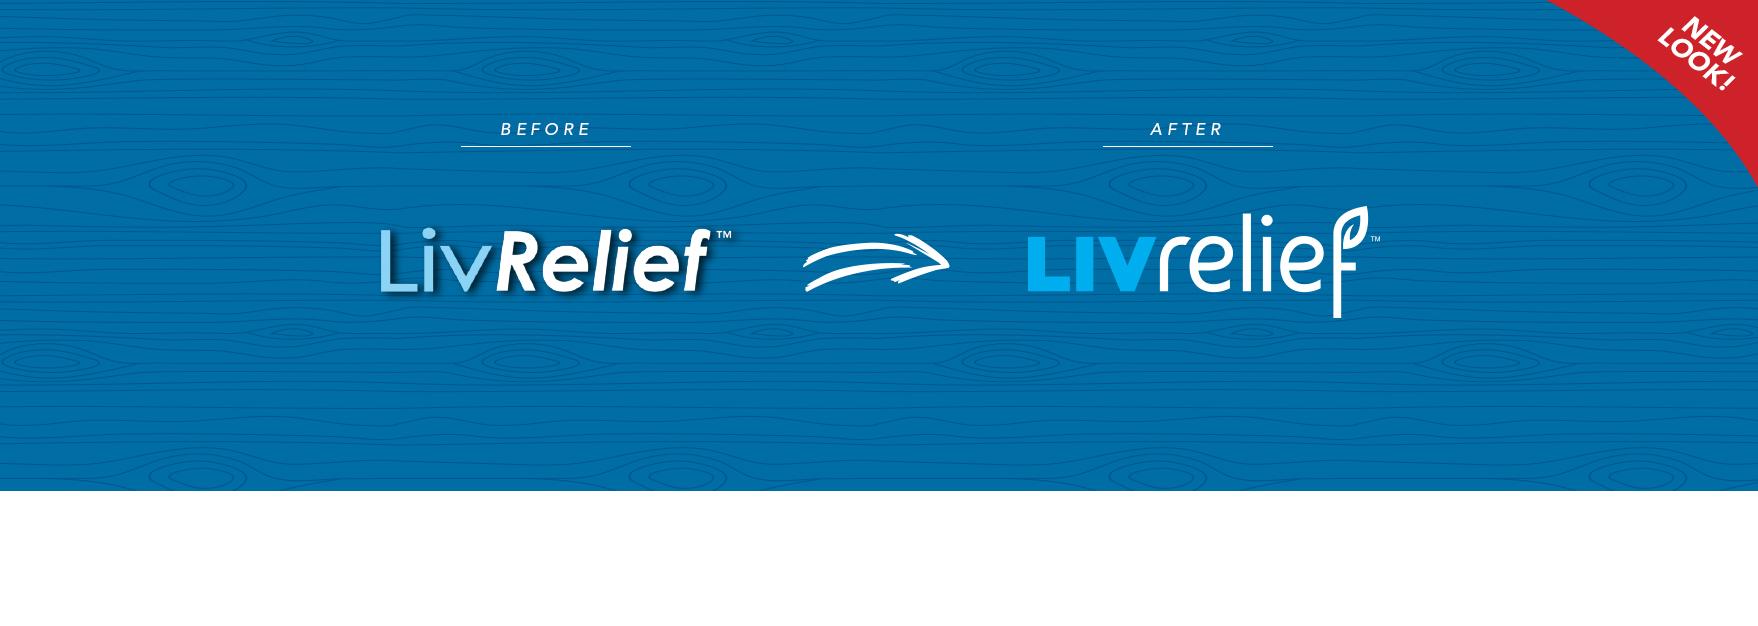 LivRelief Old to New Logo